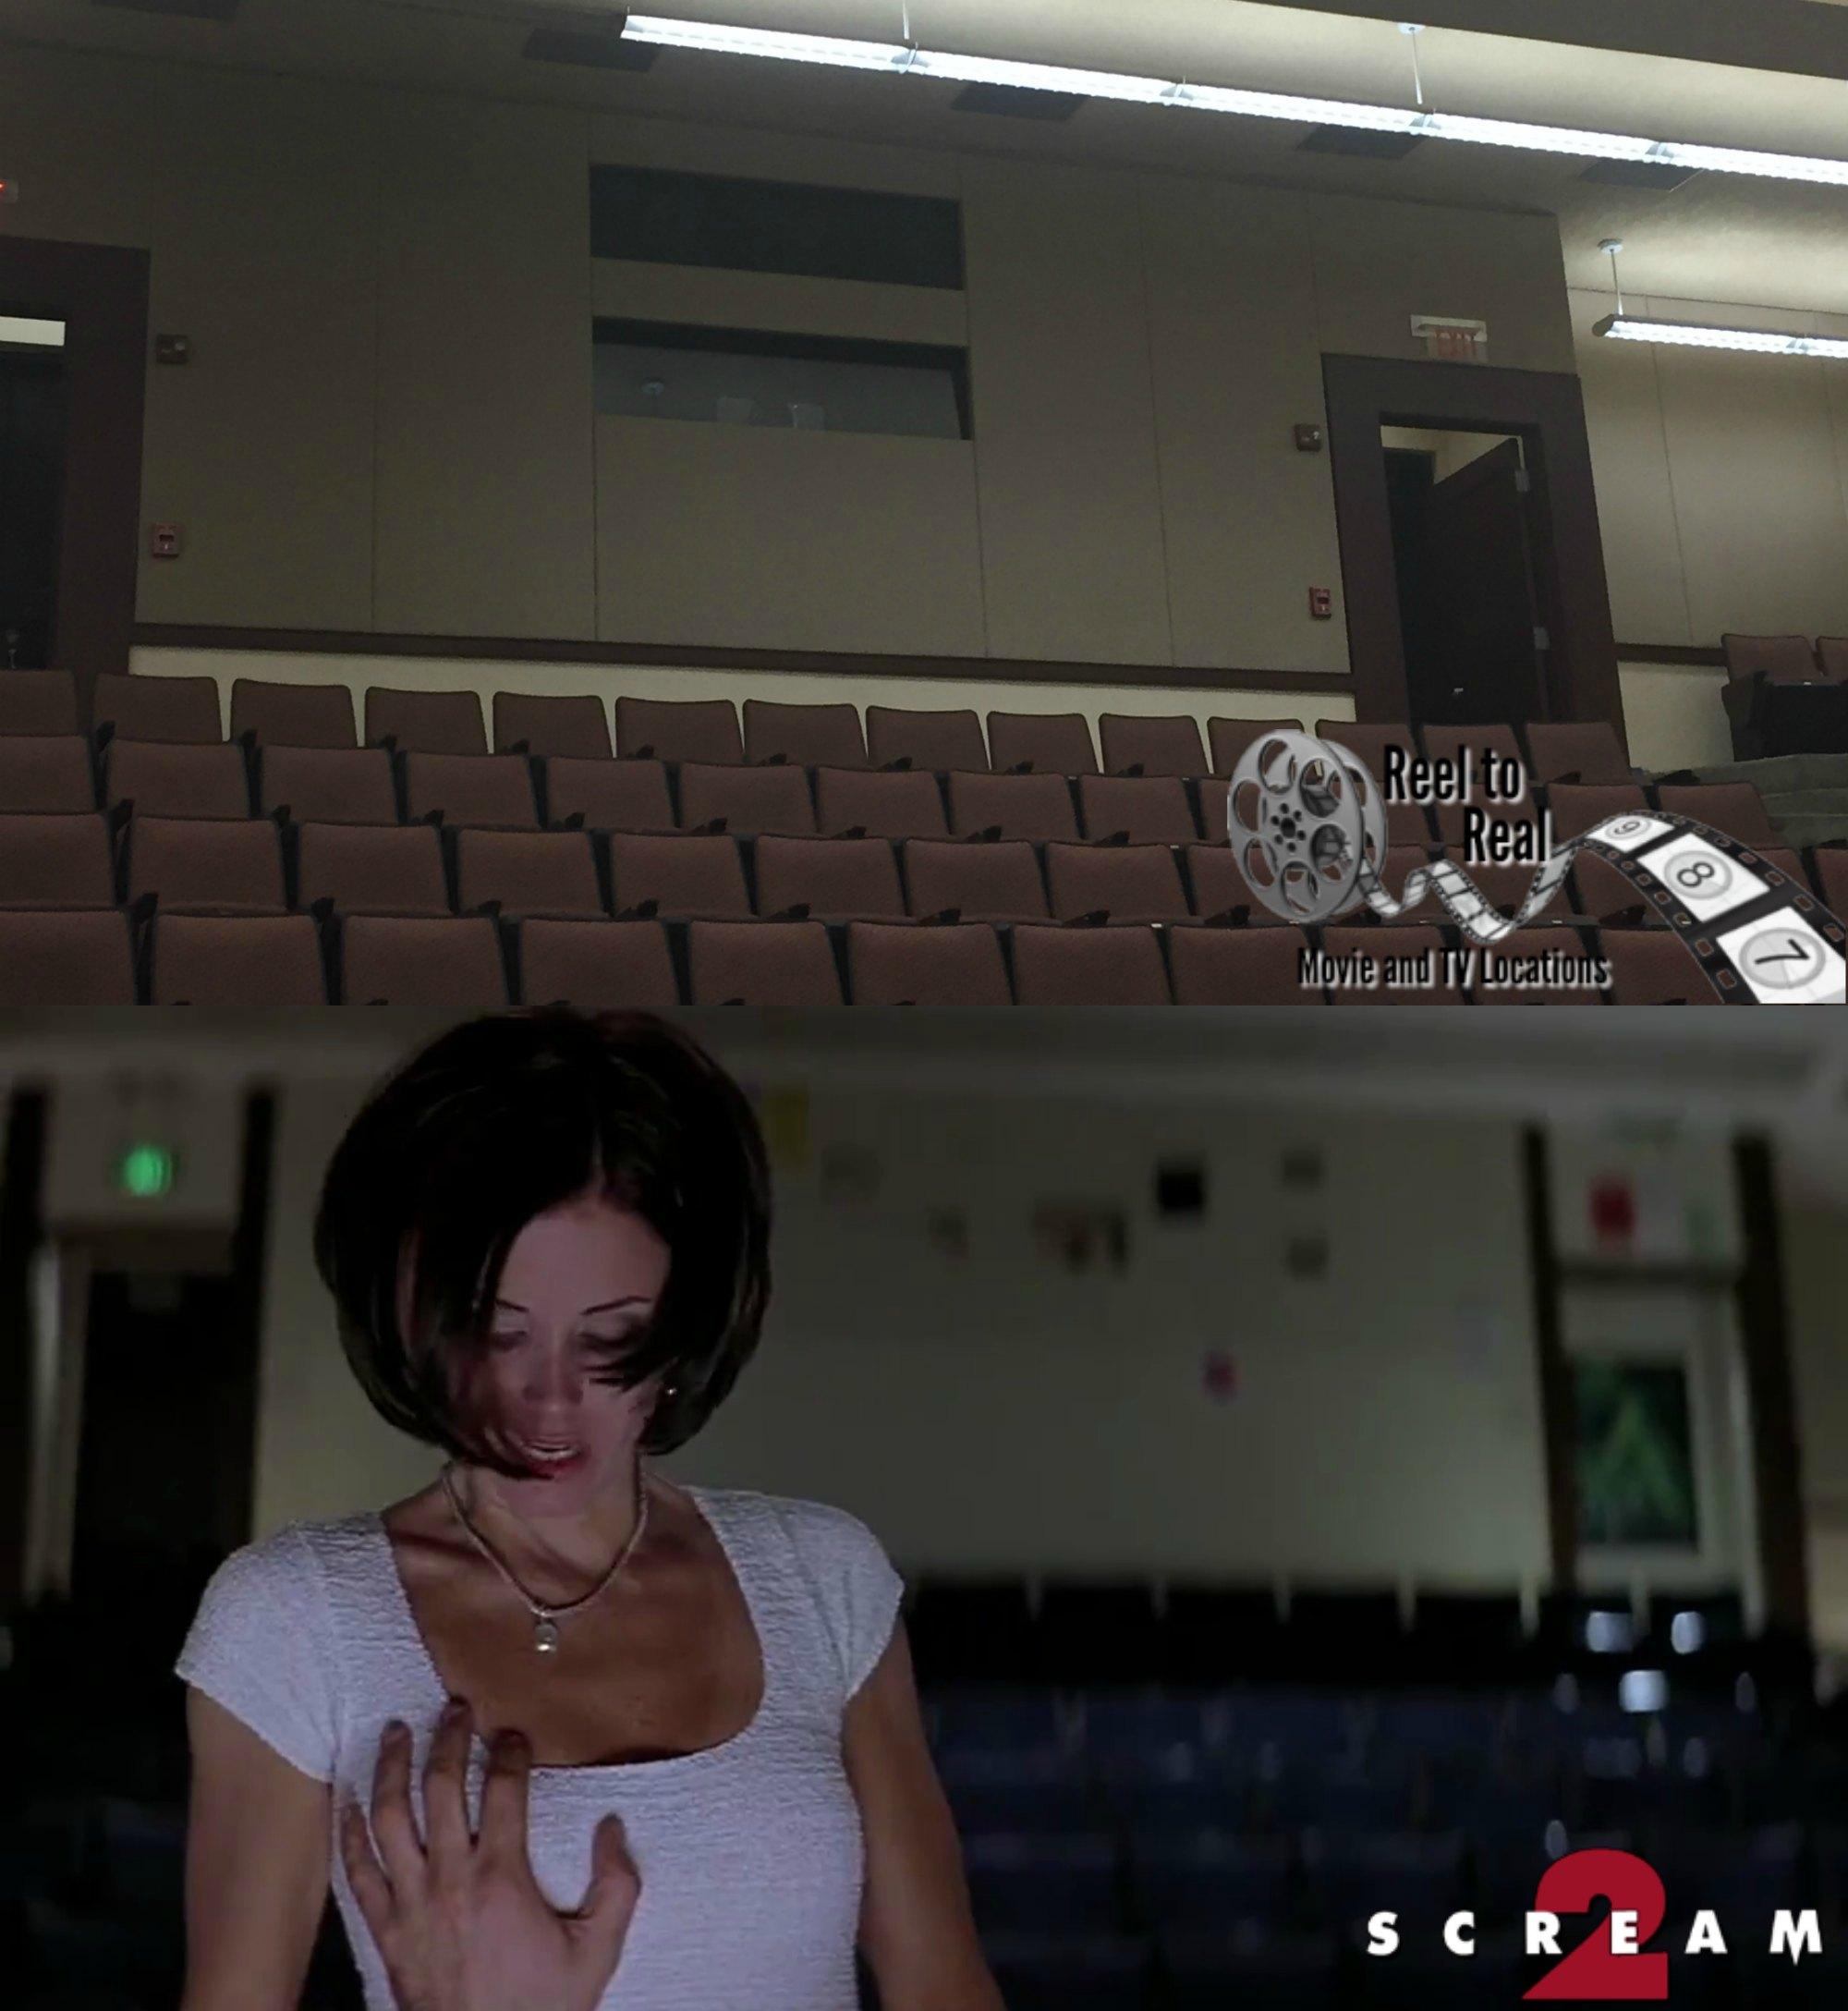 Scream 2 comparison B 09.jpg